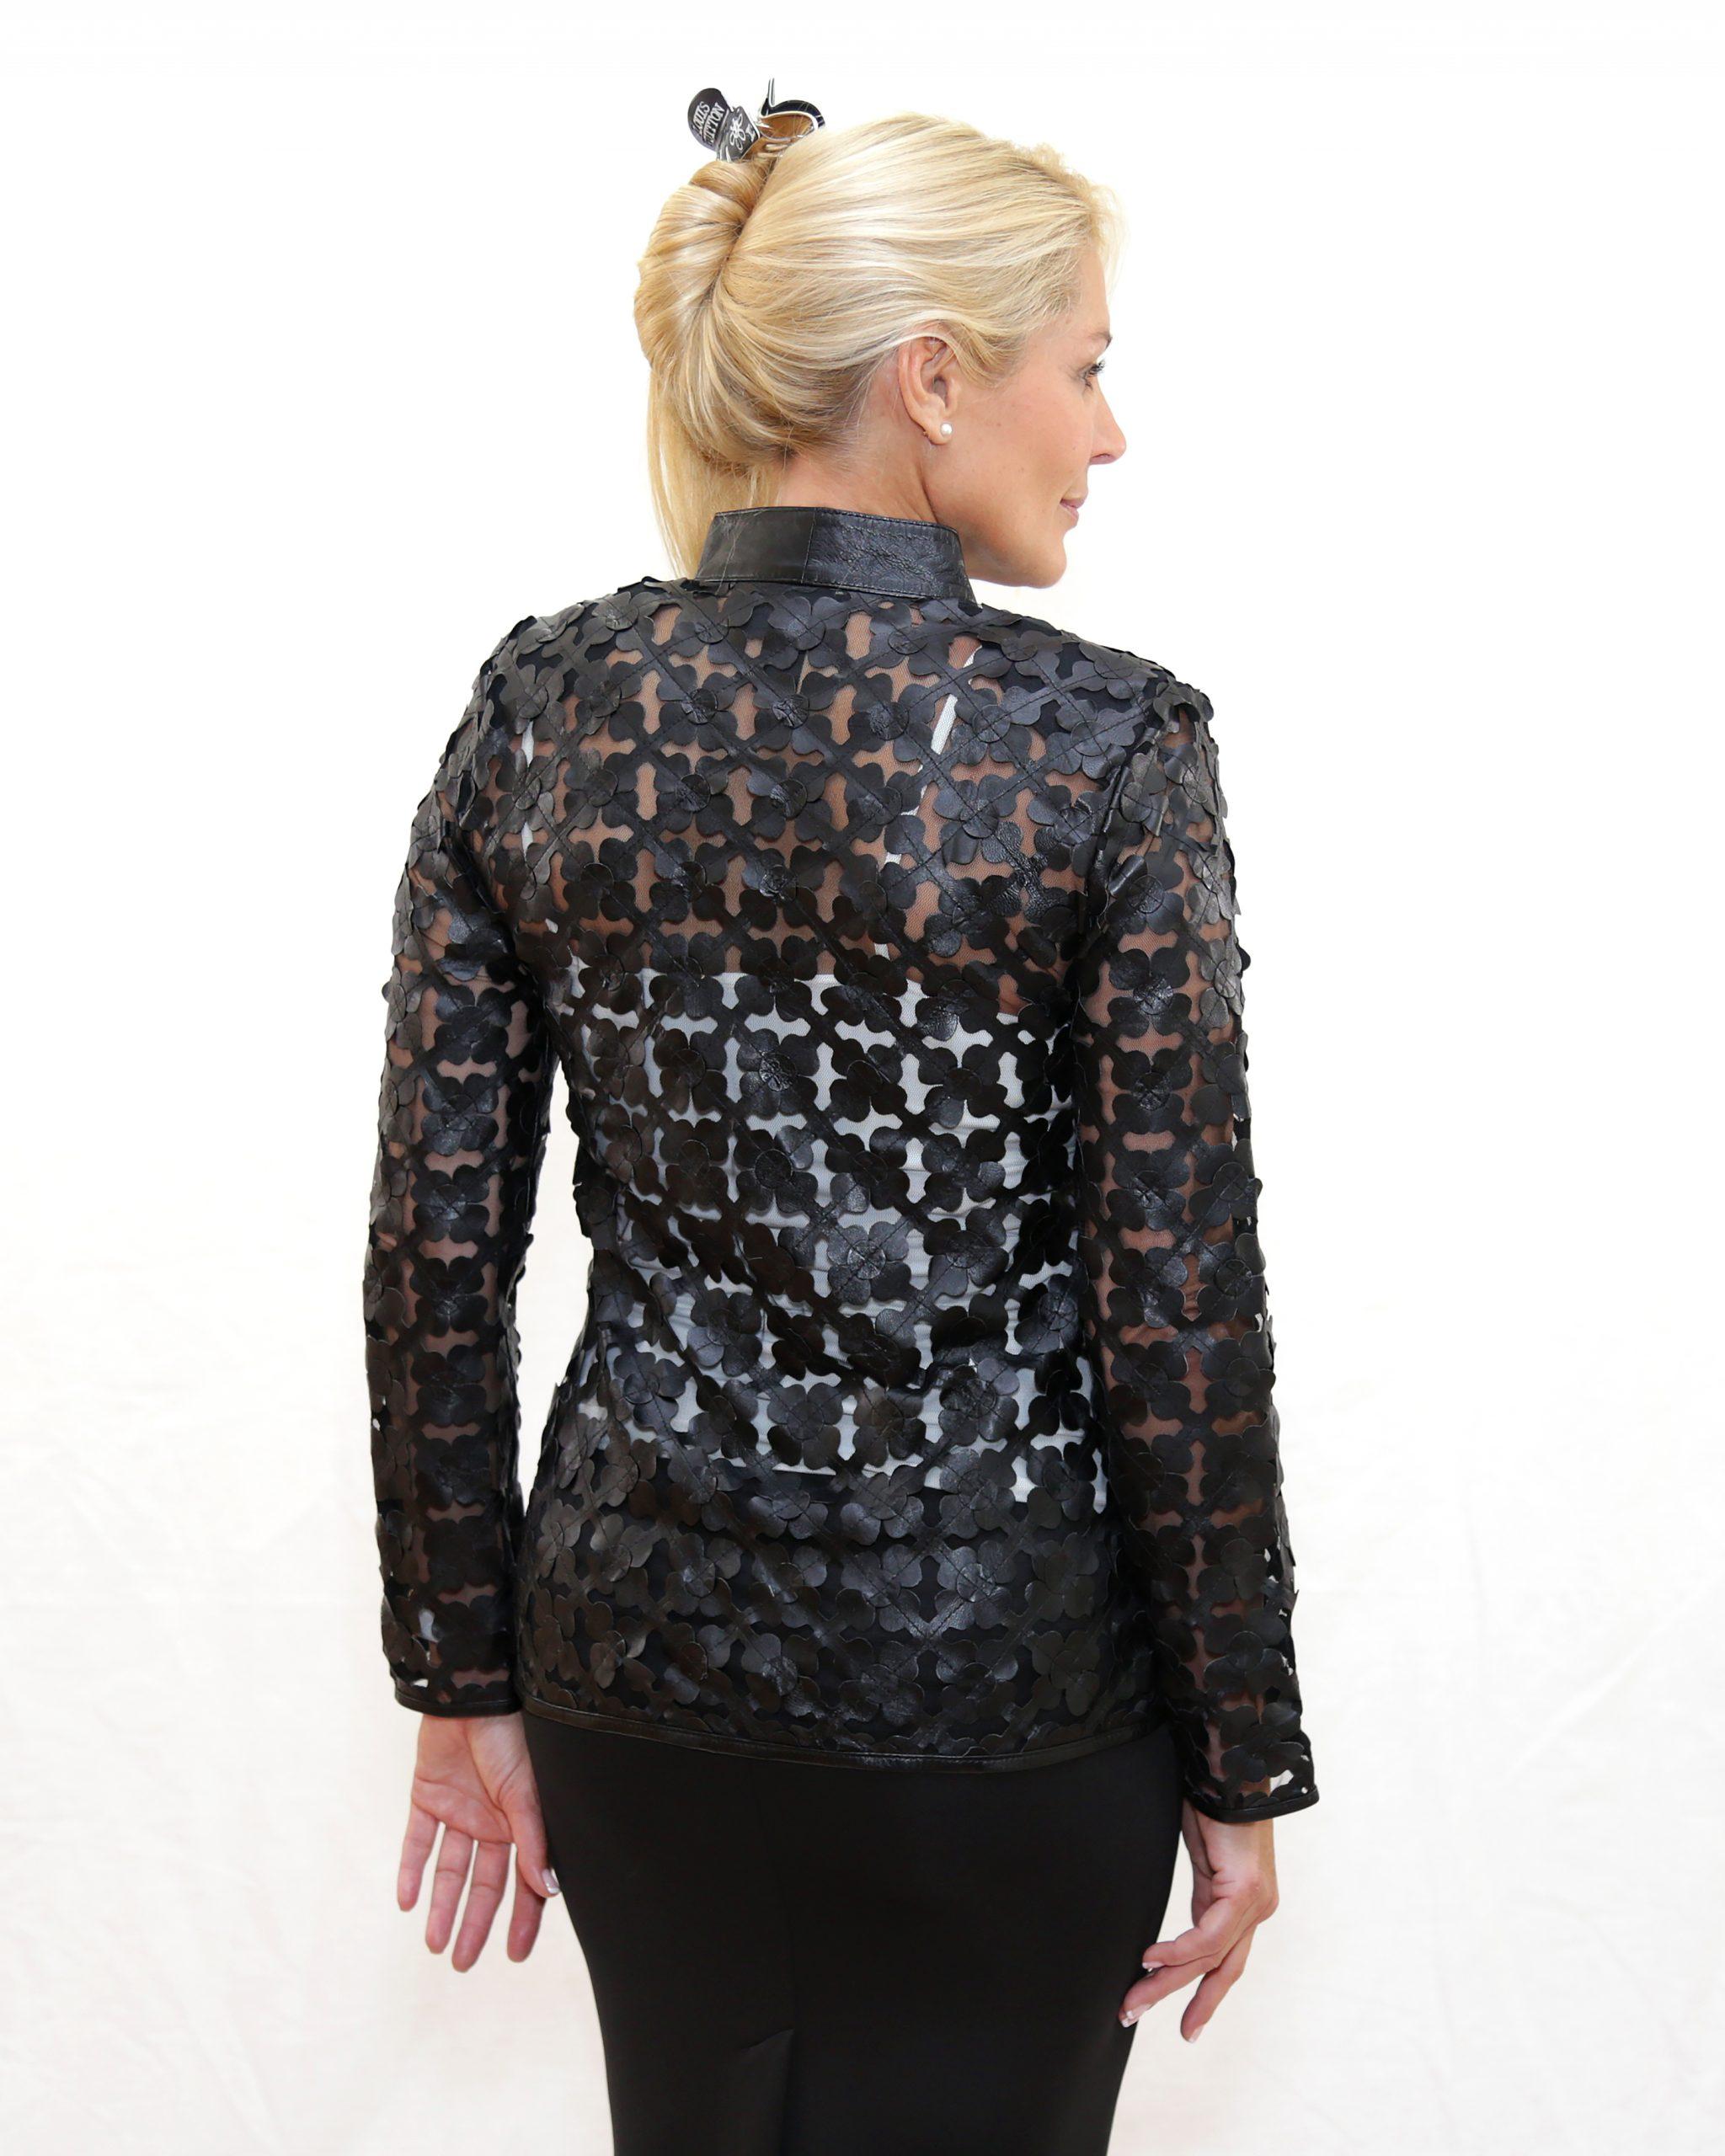 Black Perforated Leather Jacket